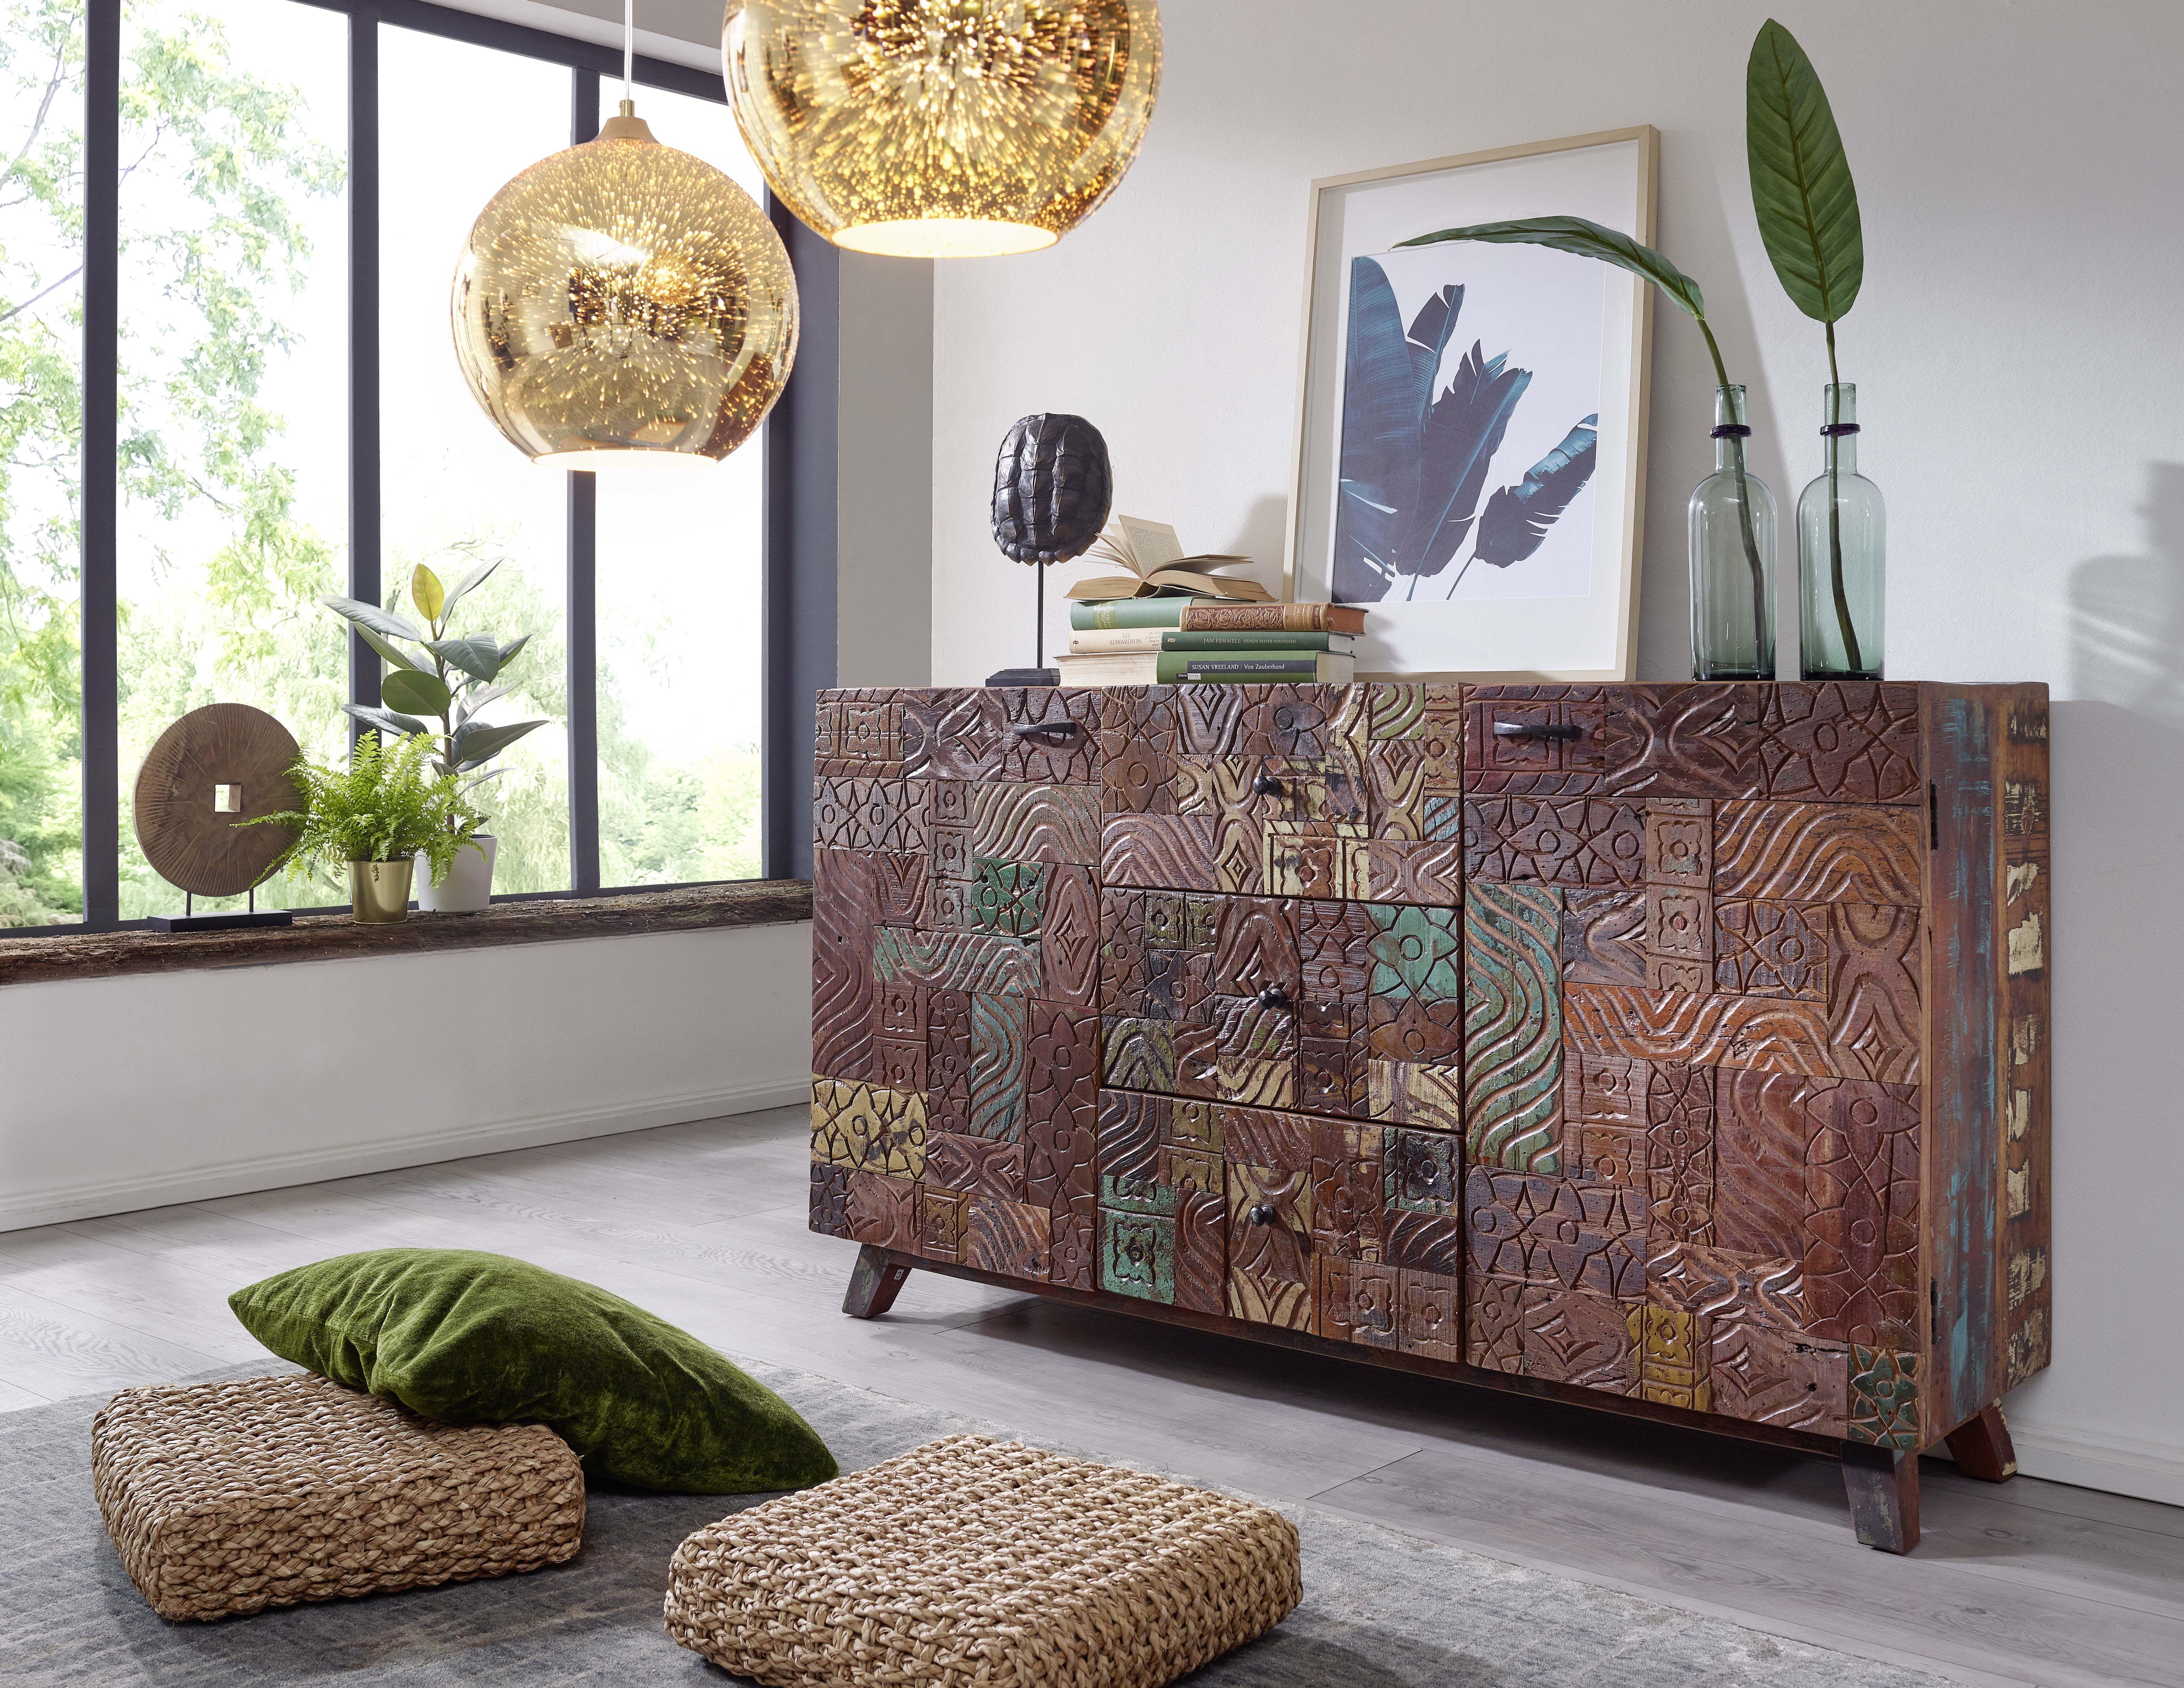 Wohnling Sideboard Carved Wl5 545 Aus Recyceltem Massivholz Commode Furniture Home Decor Decor